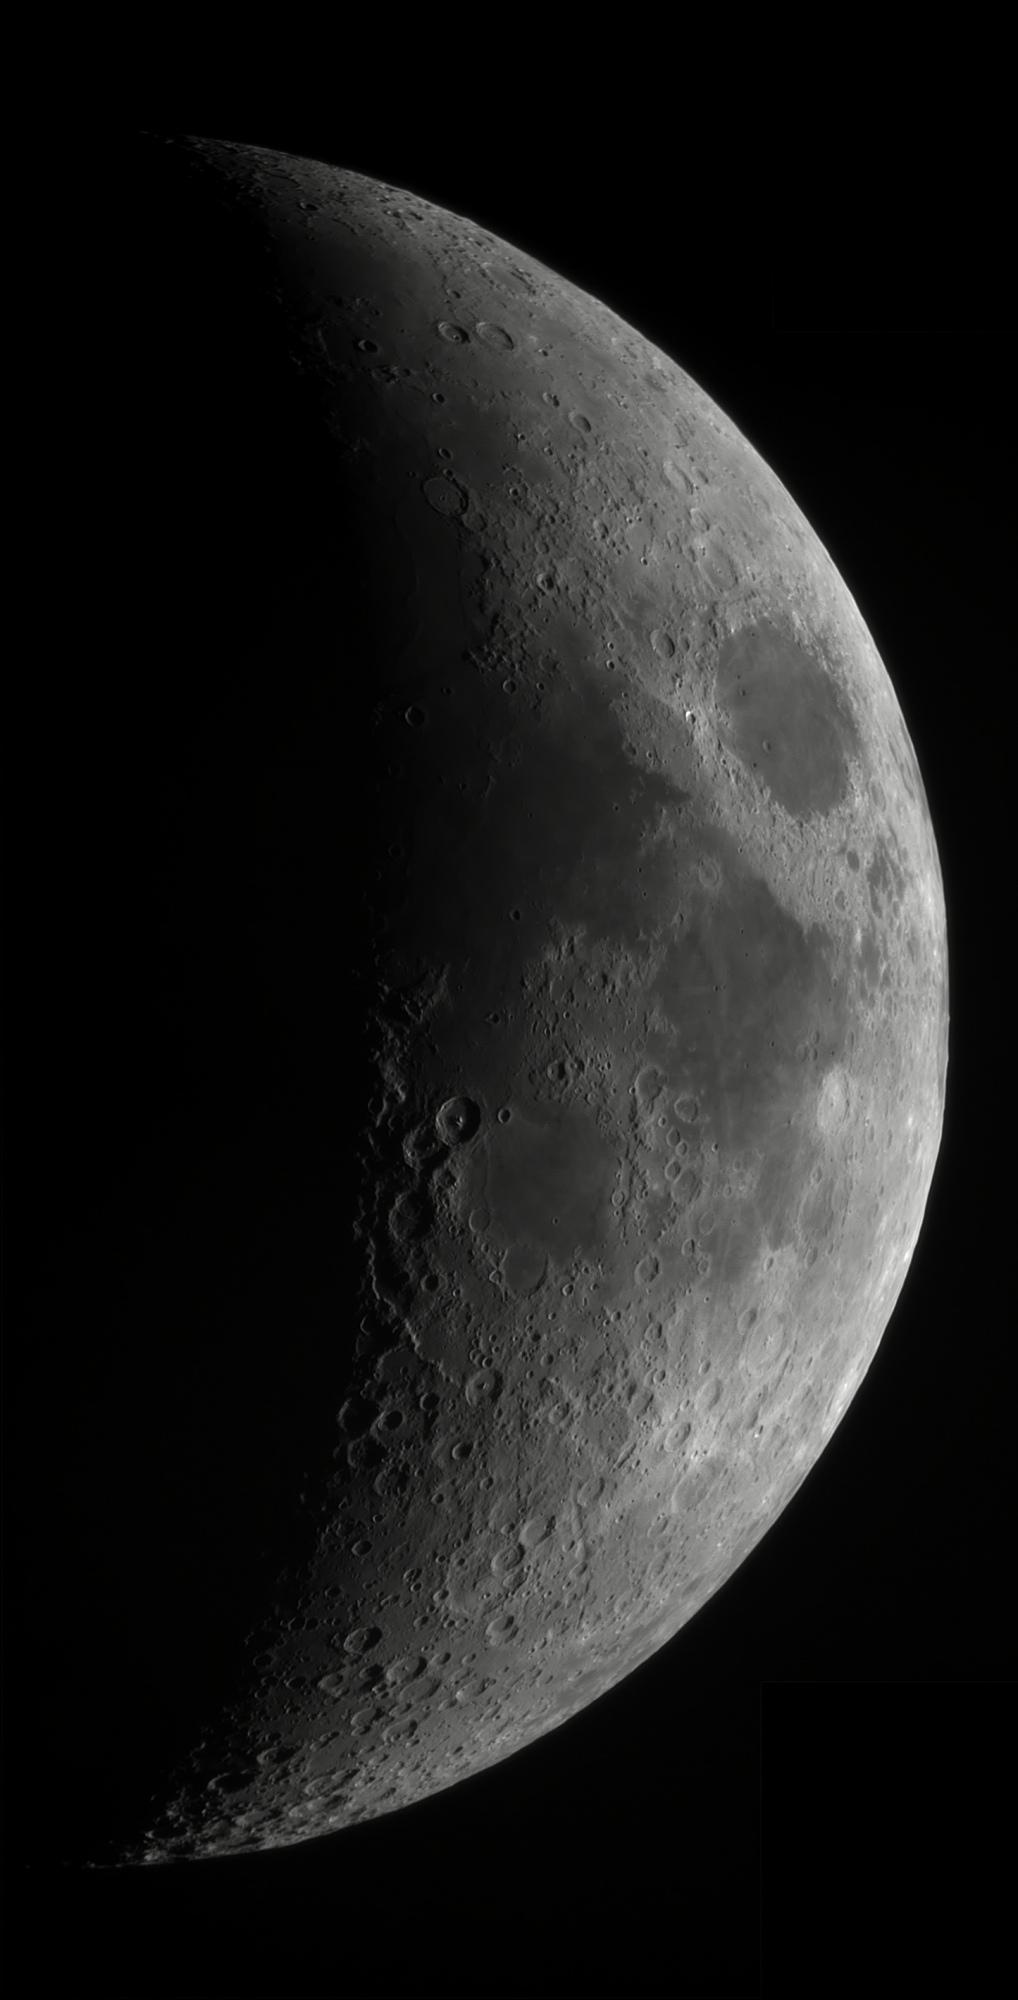 5cfd3a9706d3d_Moon_185326_080619_ZWOASI290MM_IR_680nm_AS_P45_lapl4_ap221_stitch.thumb.jpg.1ebbb9e0555cc0b67f4fc45c7aa41de6.jpg